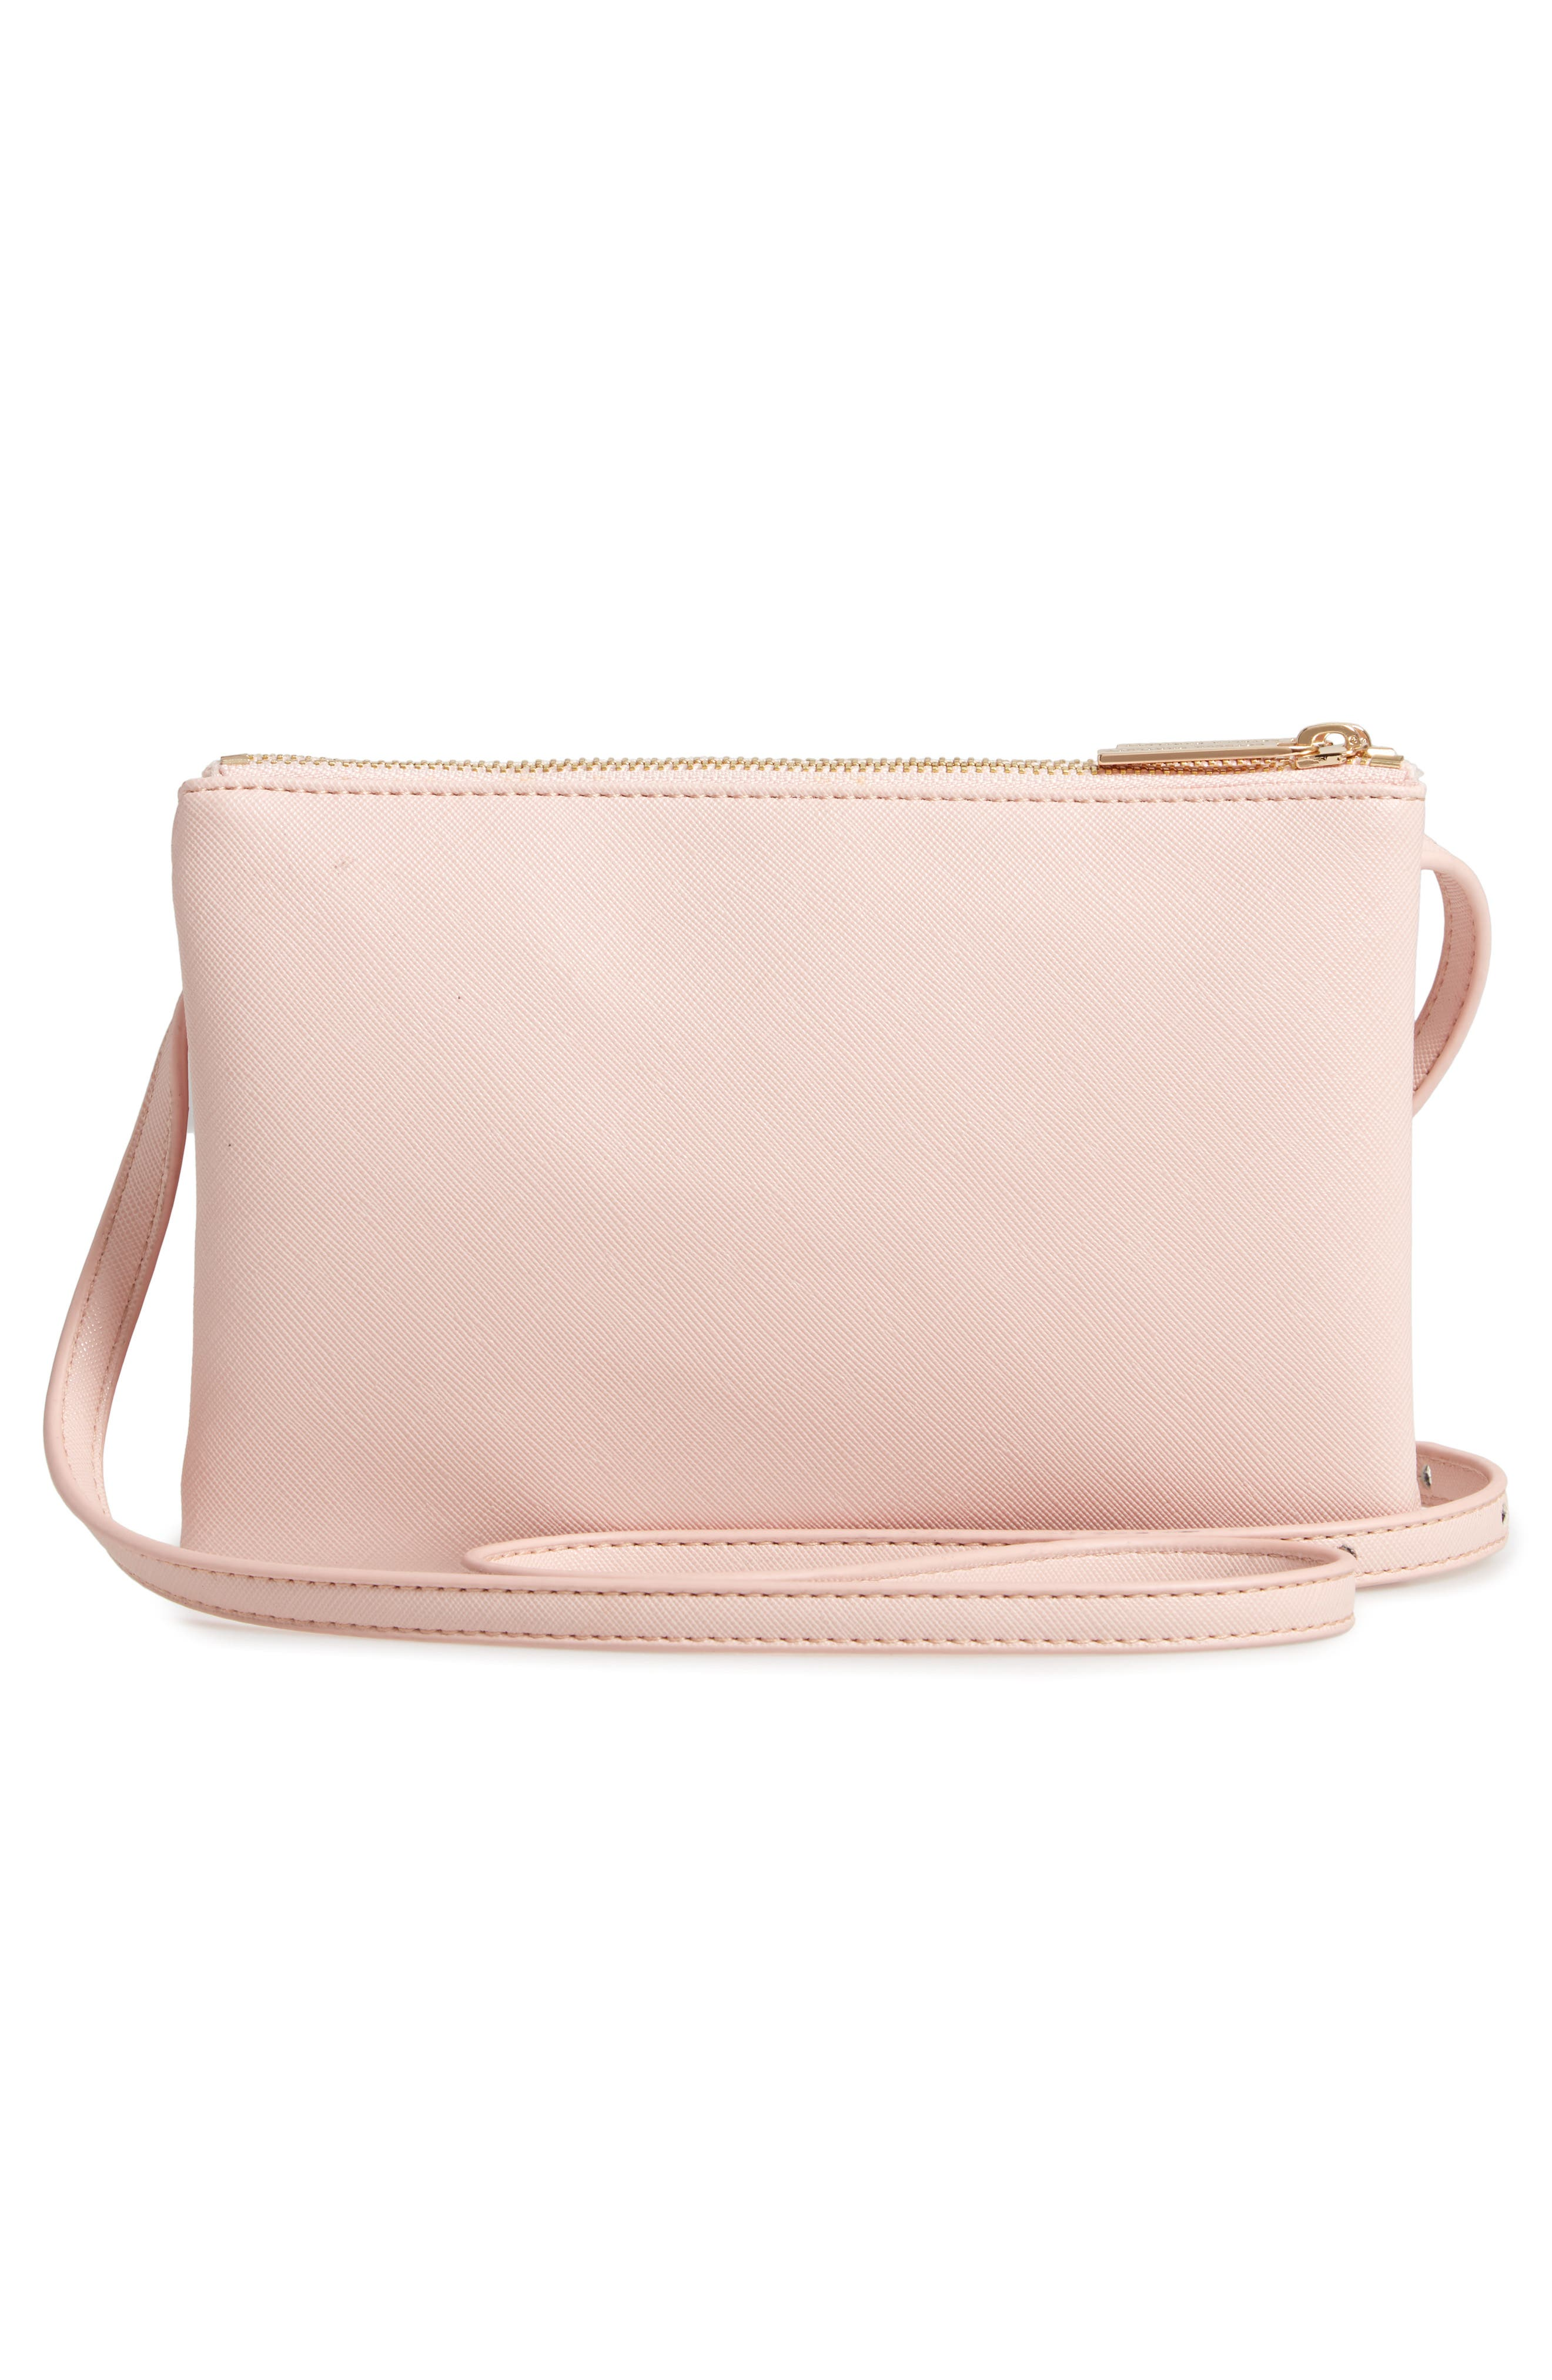 ESTELLA BARTLETT,                             Double Faux Leather Crossbody Bag,                             Alternate thumbnail 3, color,                             BLUSH